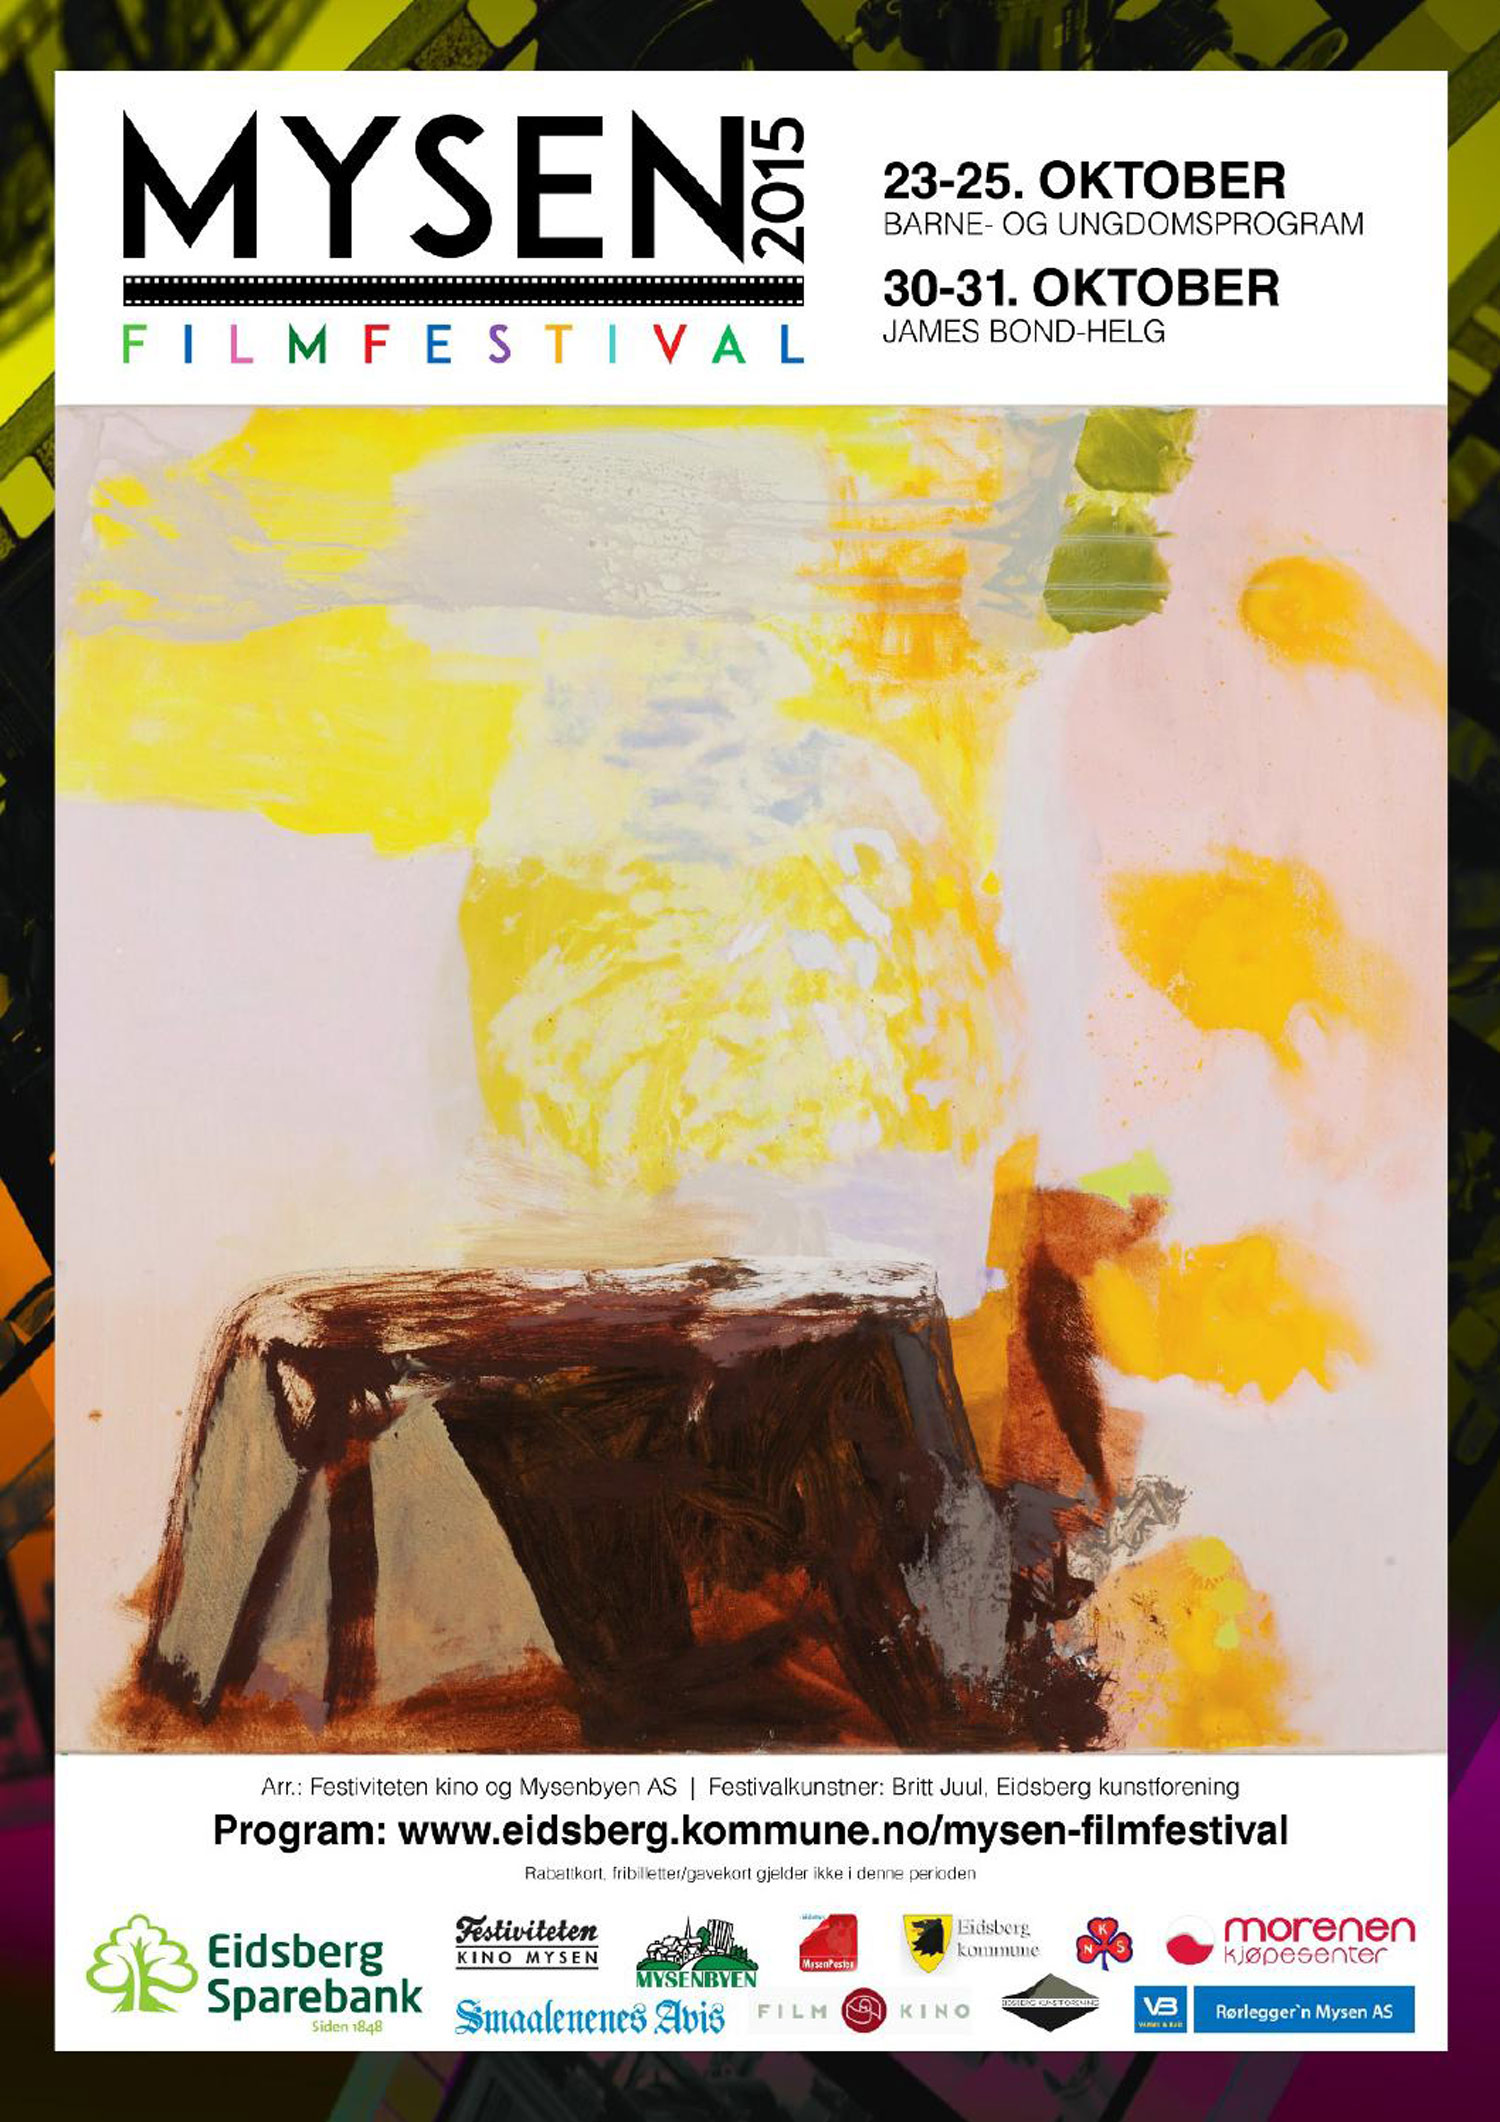 Mysen Filmfestival